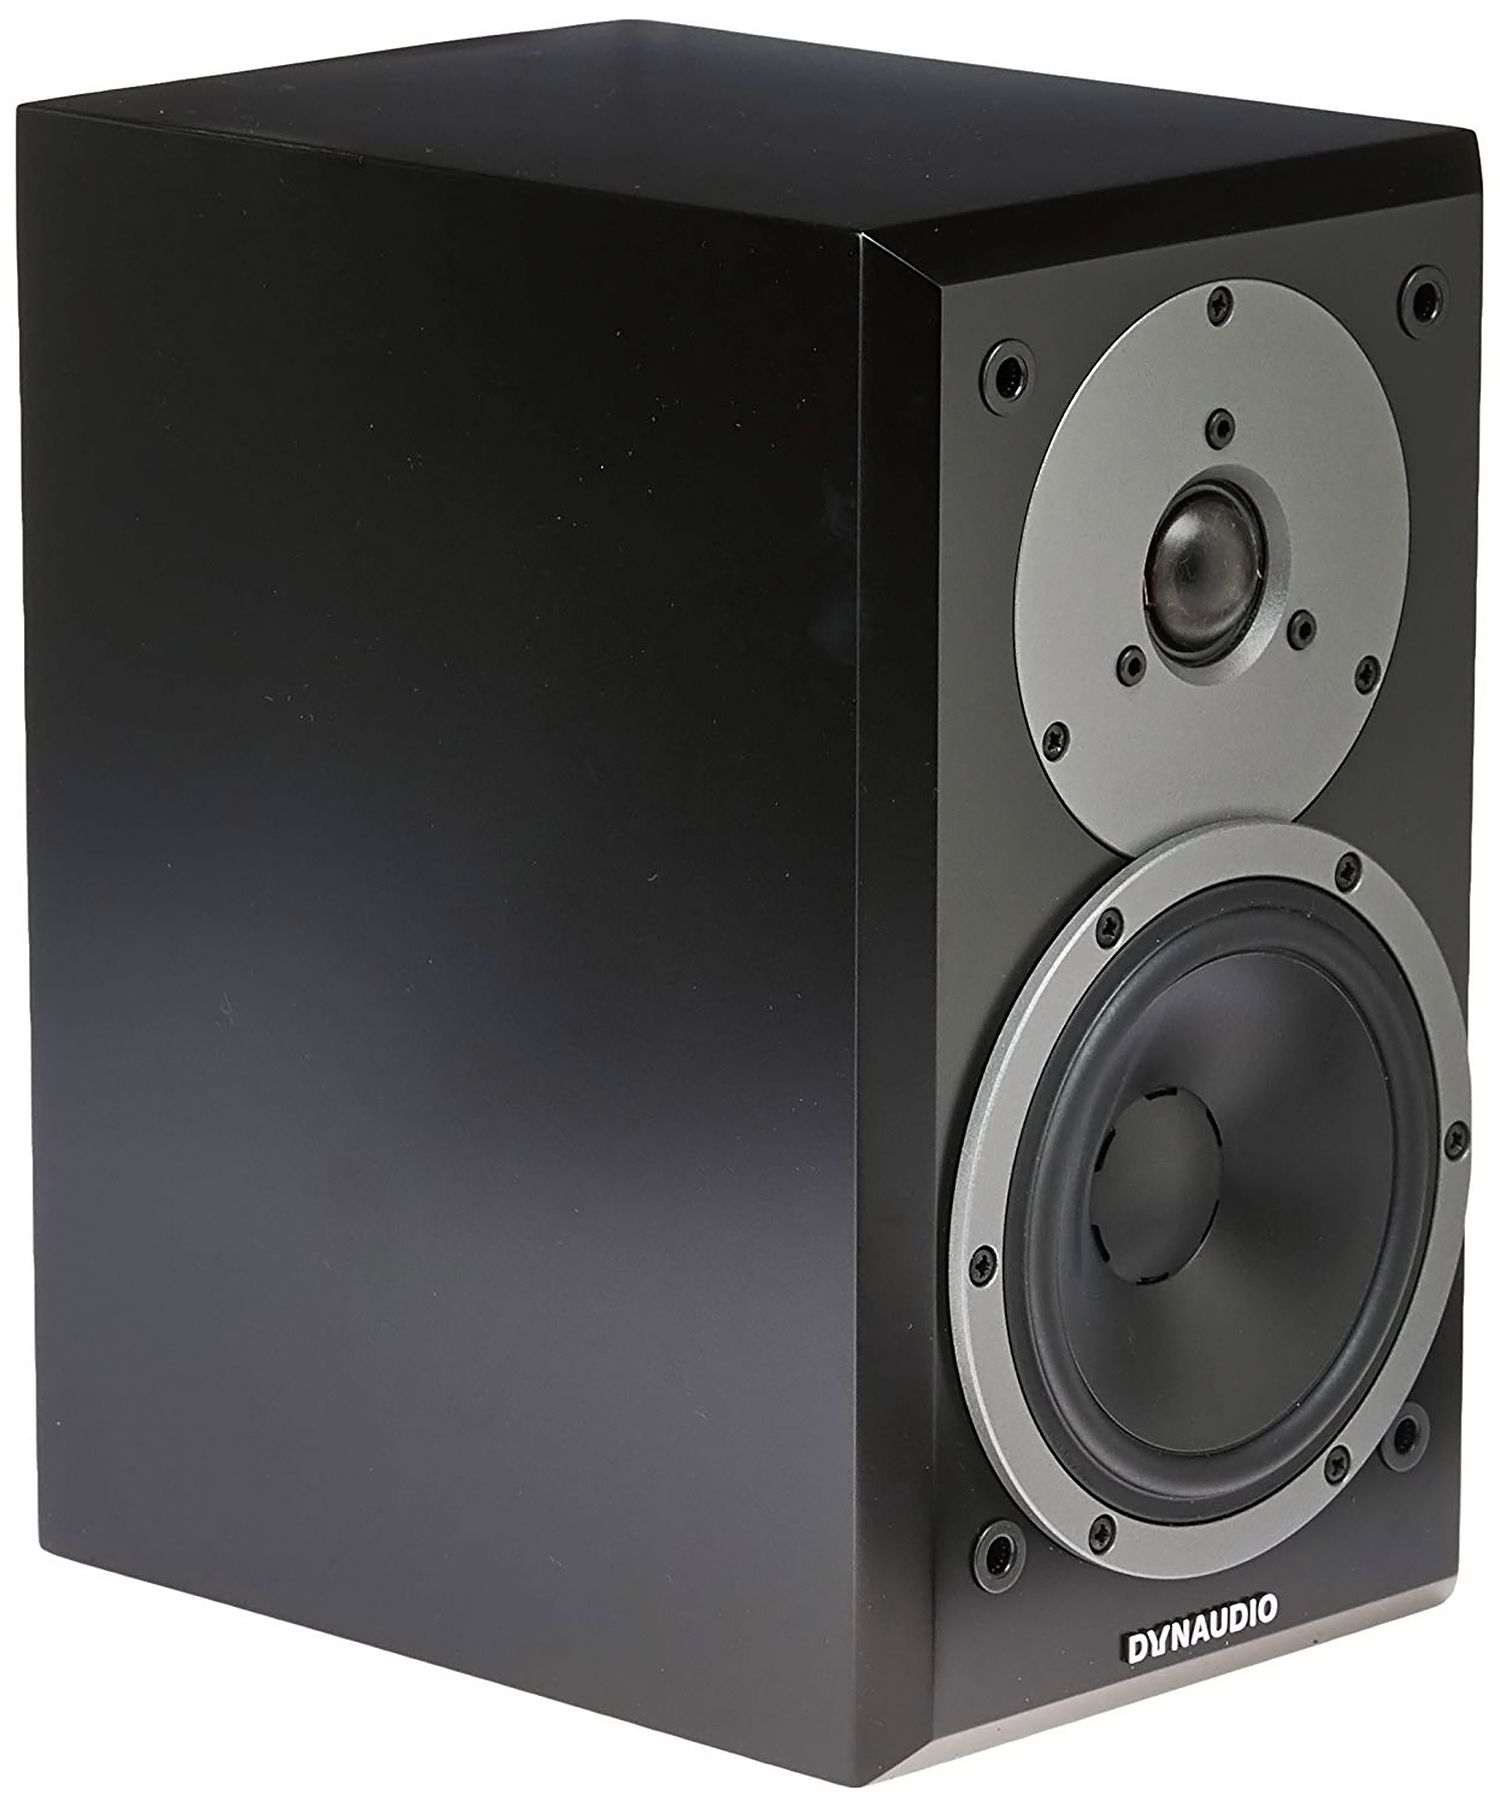 Dynaudio Emit M10 Loudspeaker